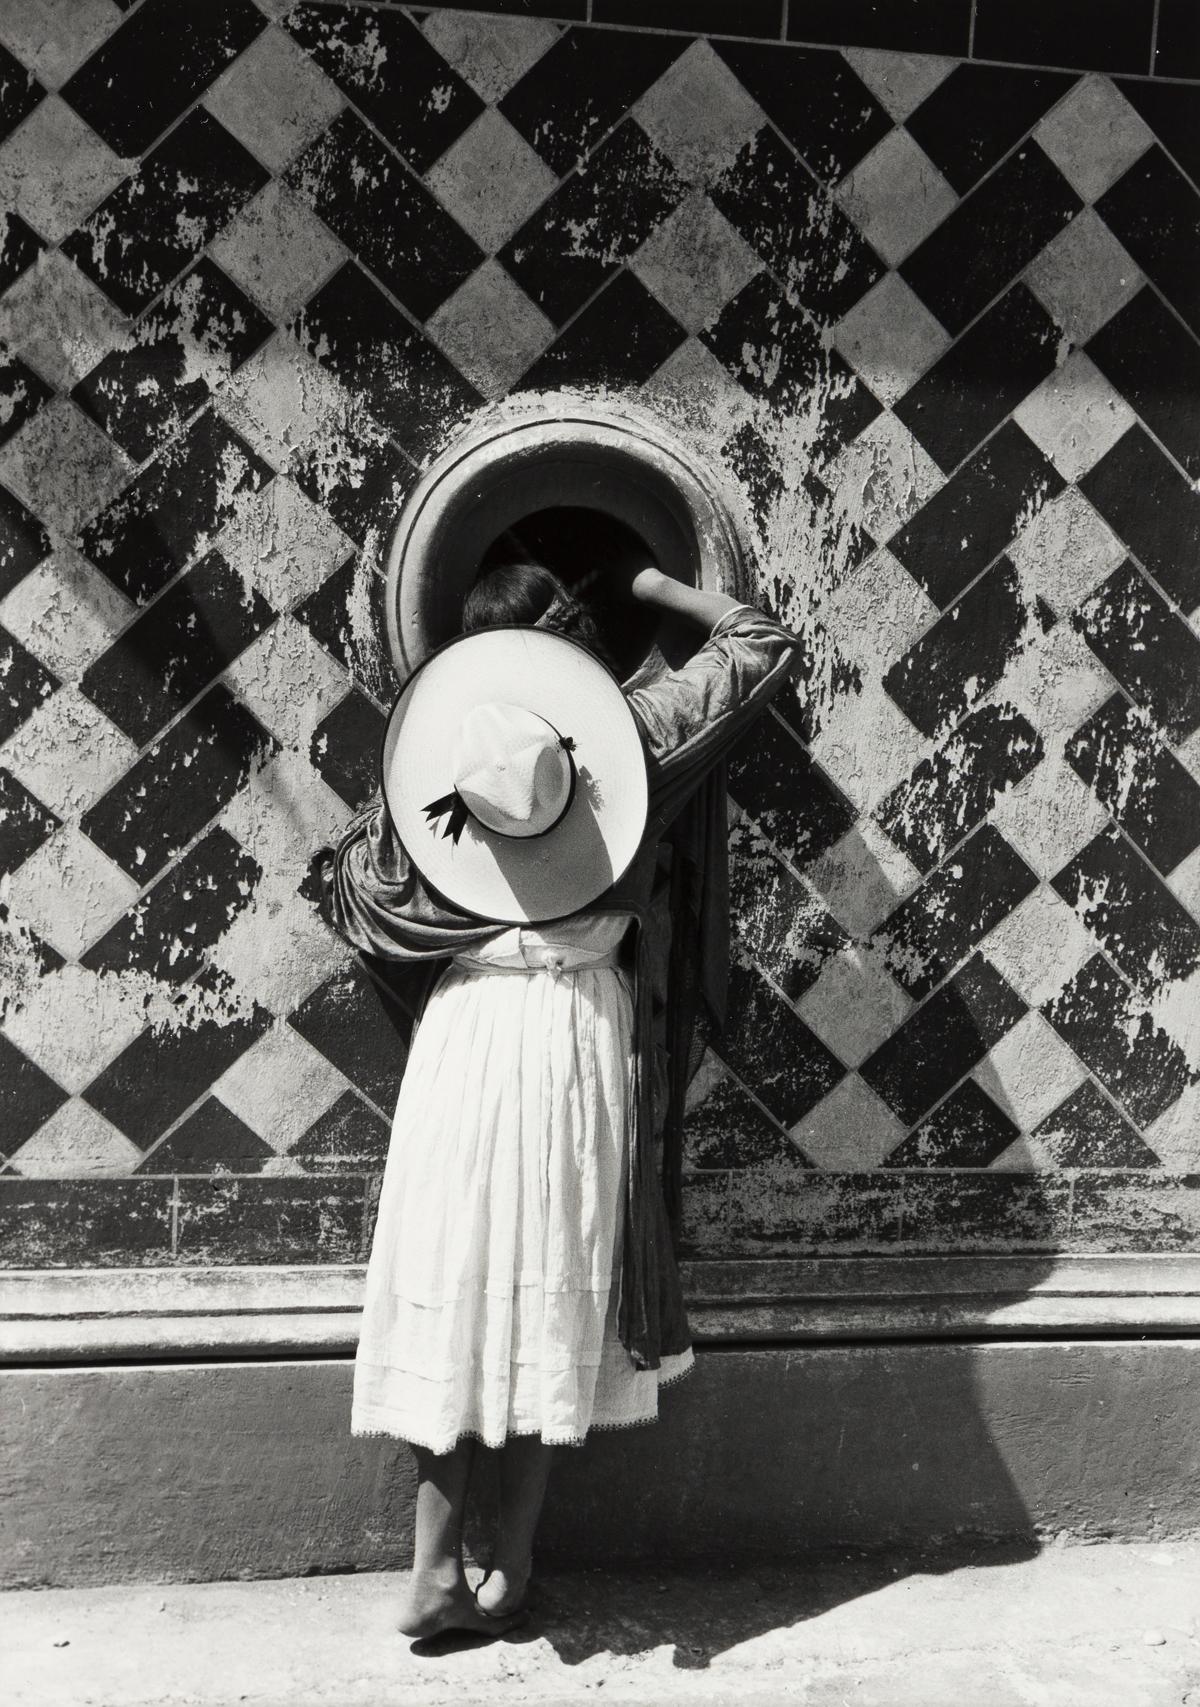 MANUEL ÁLVAREZ BRAVO (1902-2002) La Hija de los Danzantes [The Daughter of the Dancers].